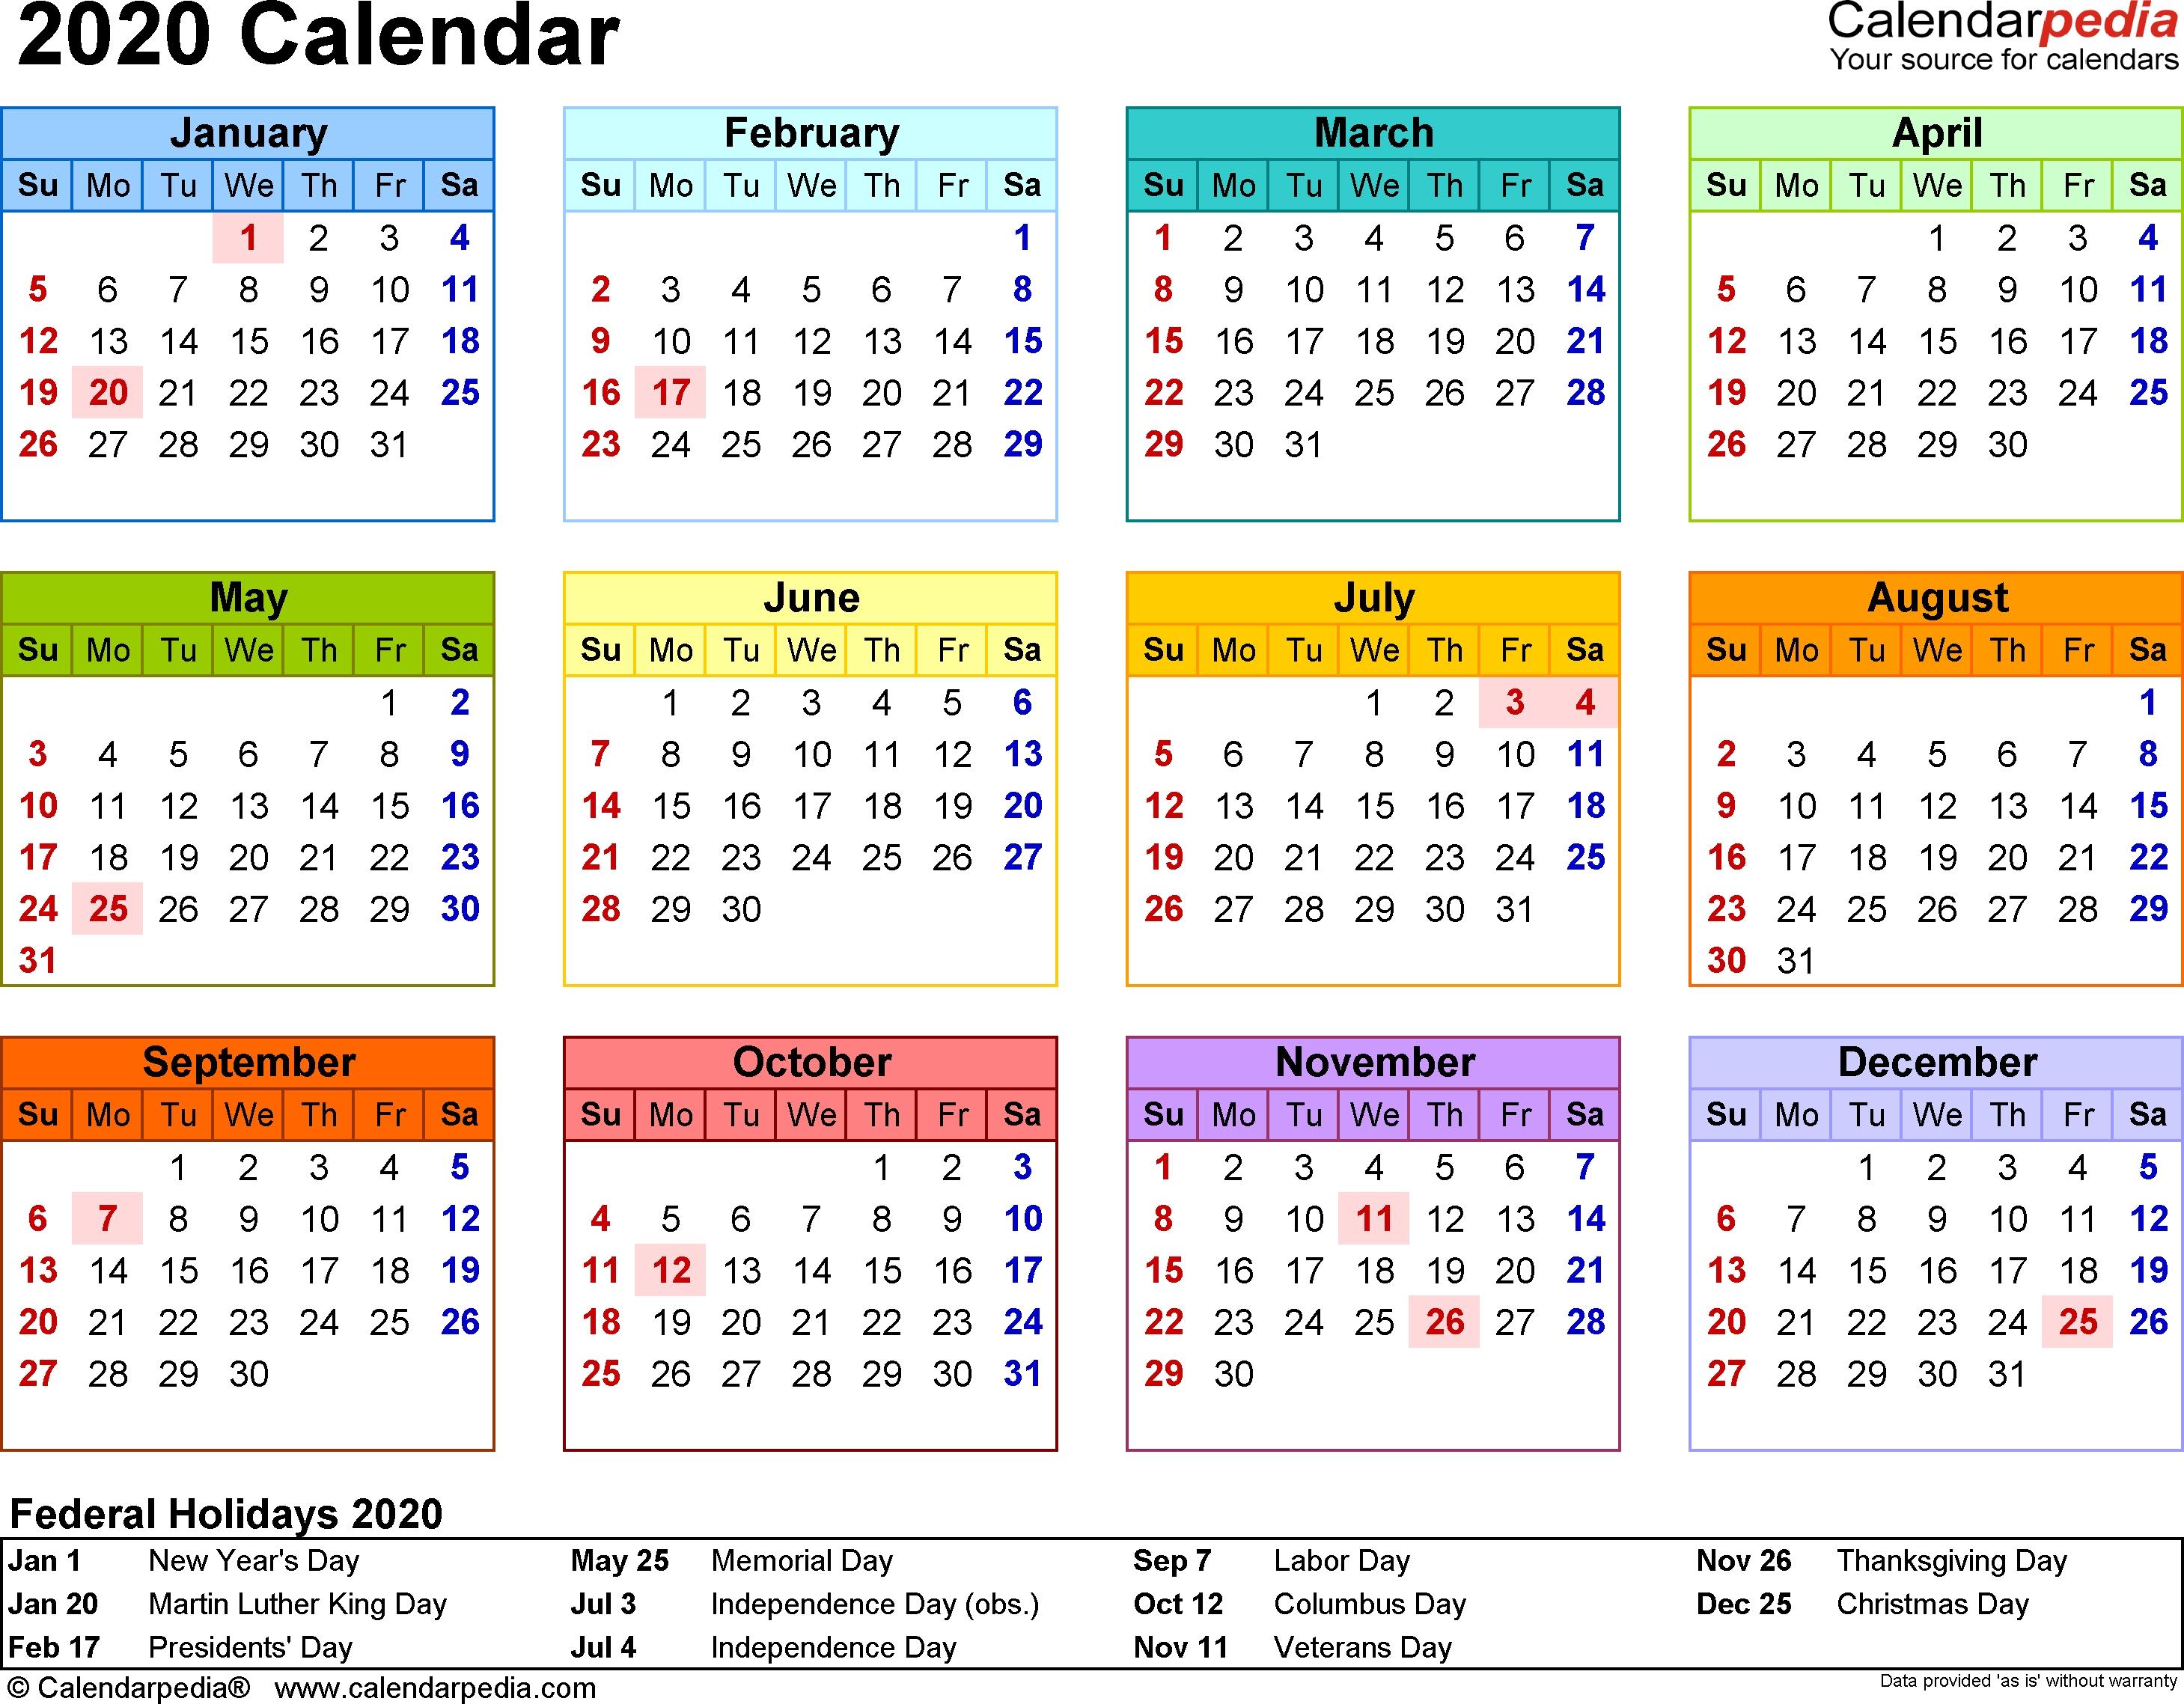 2020 Calendar Pdf - 17 Free Printable Calendar Templates inside 2020 Year At A Glance Free Printable Calendar